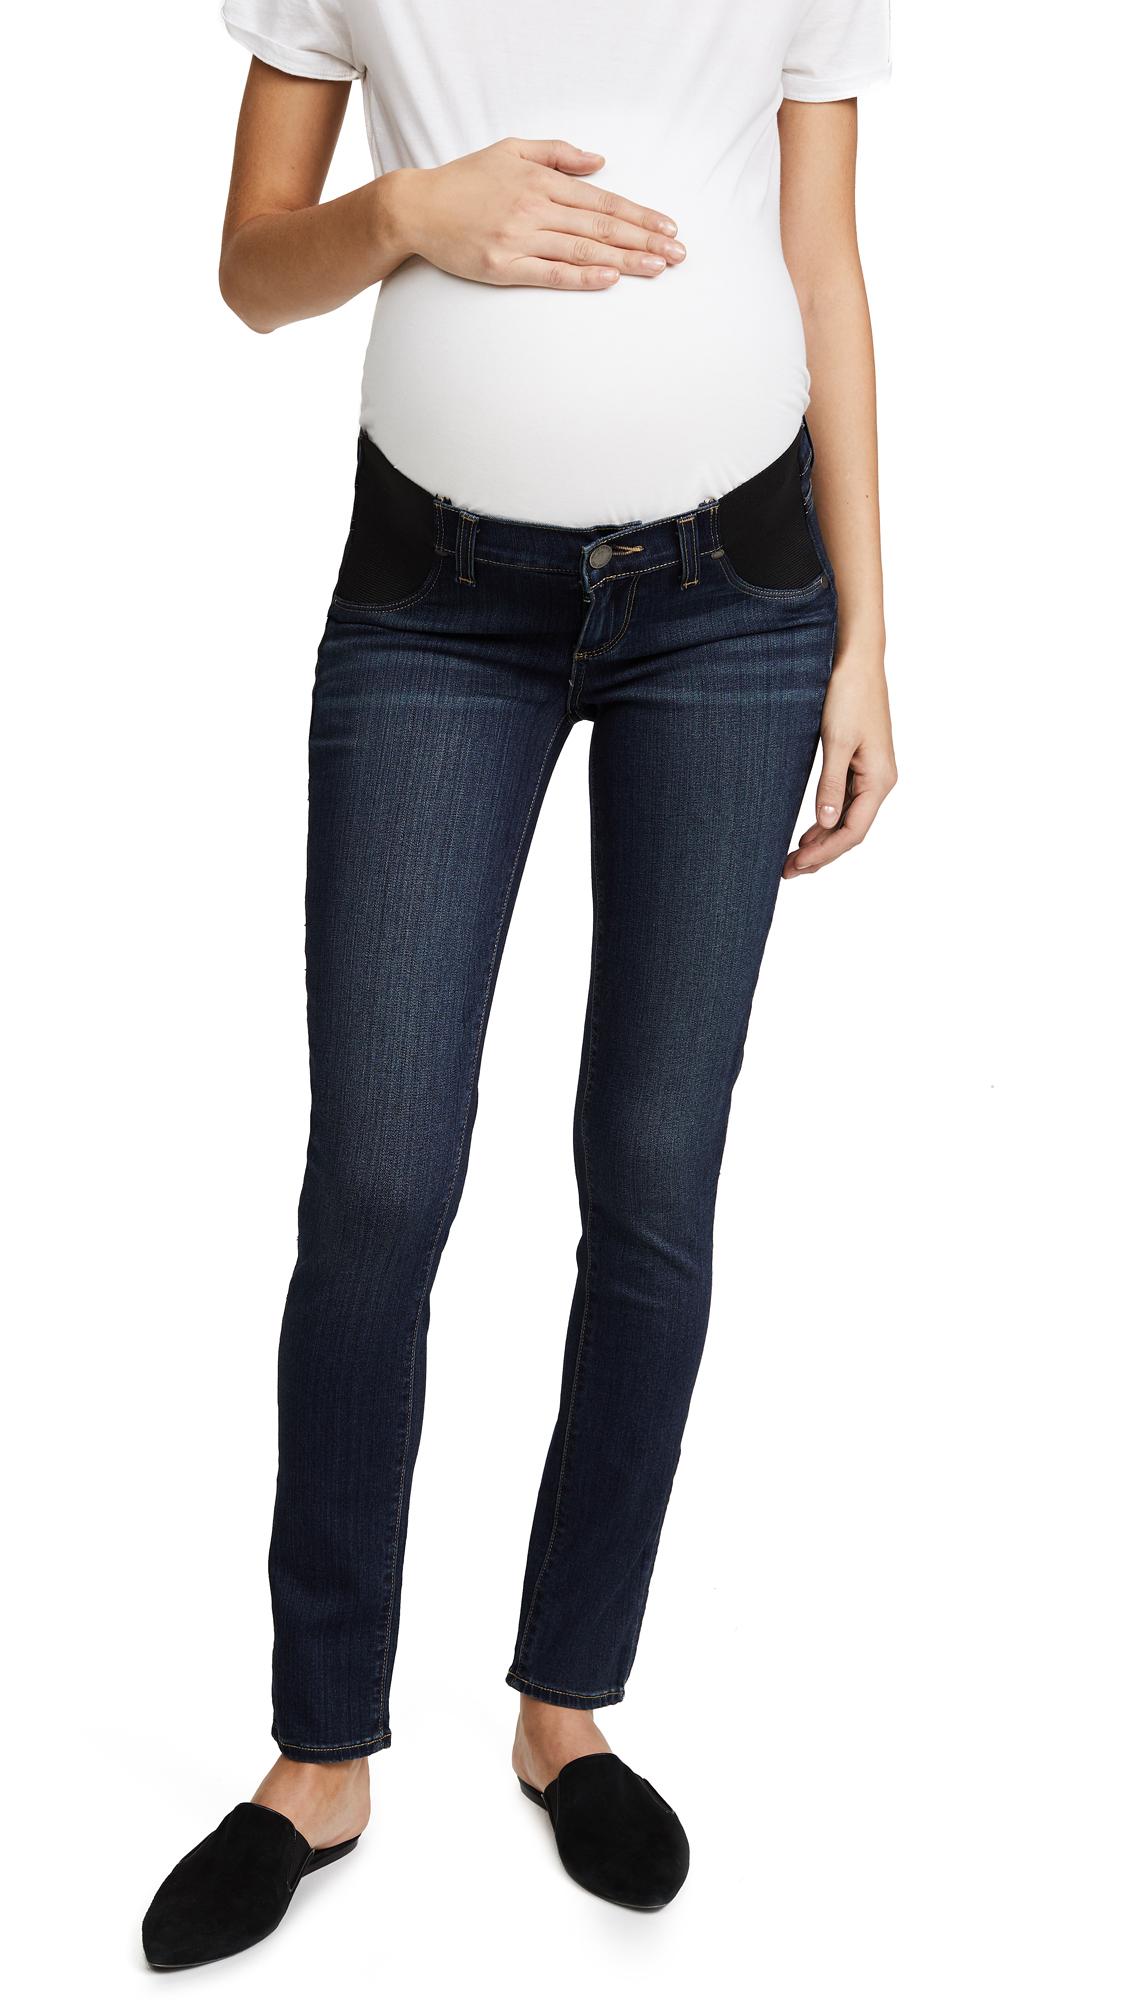 Transcend Verdugo Ultra Skinny Maternity Jeans